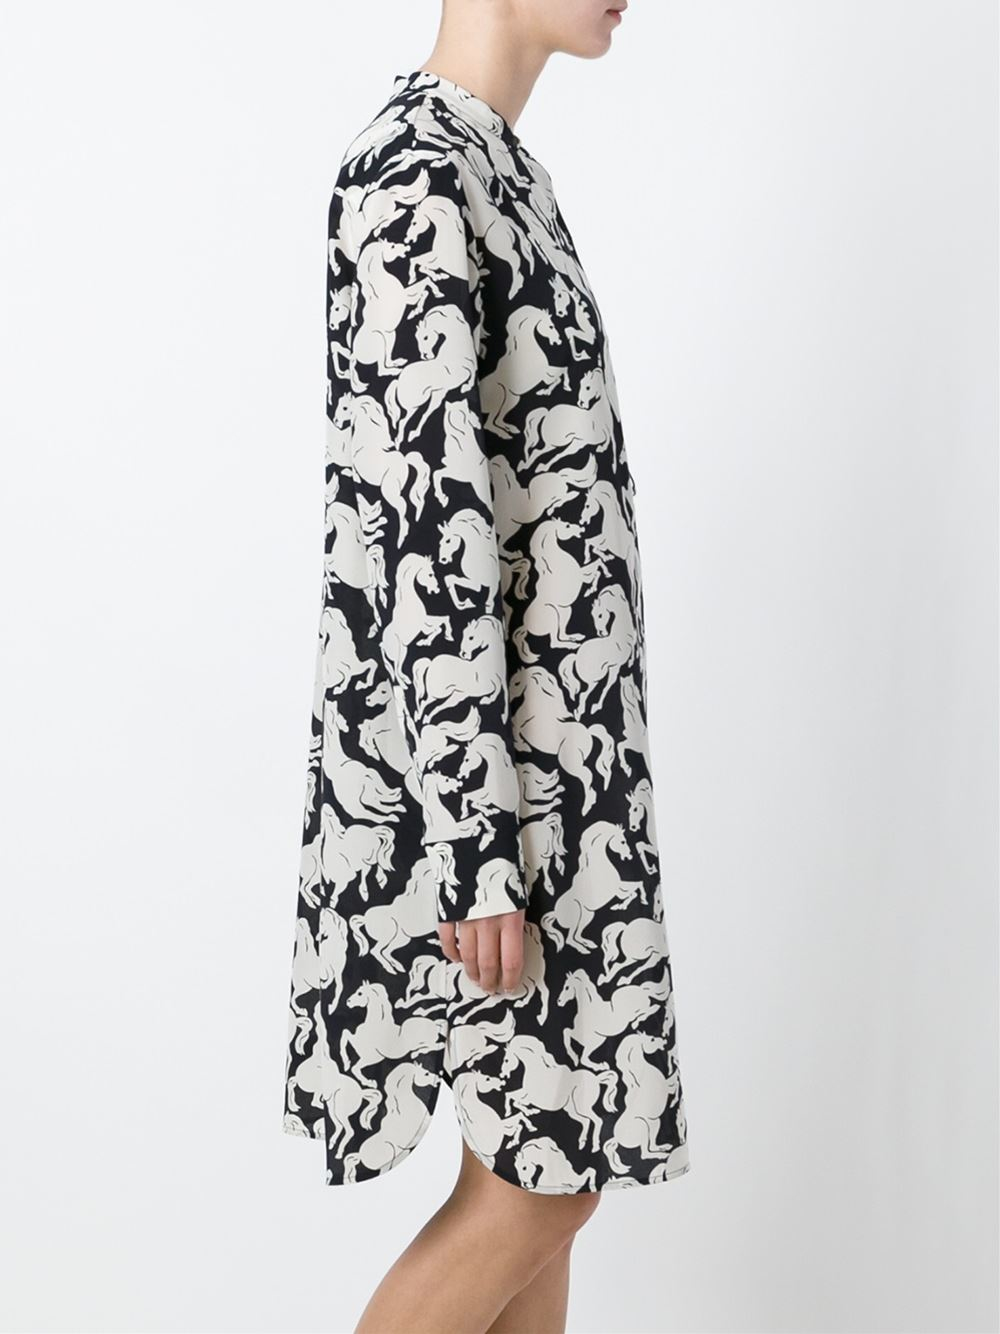 Stella Mccartney Horse Print Dress Lyst